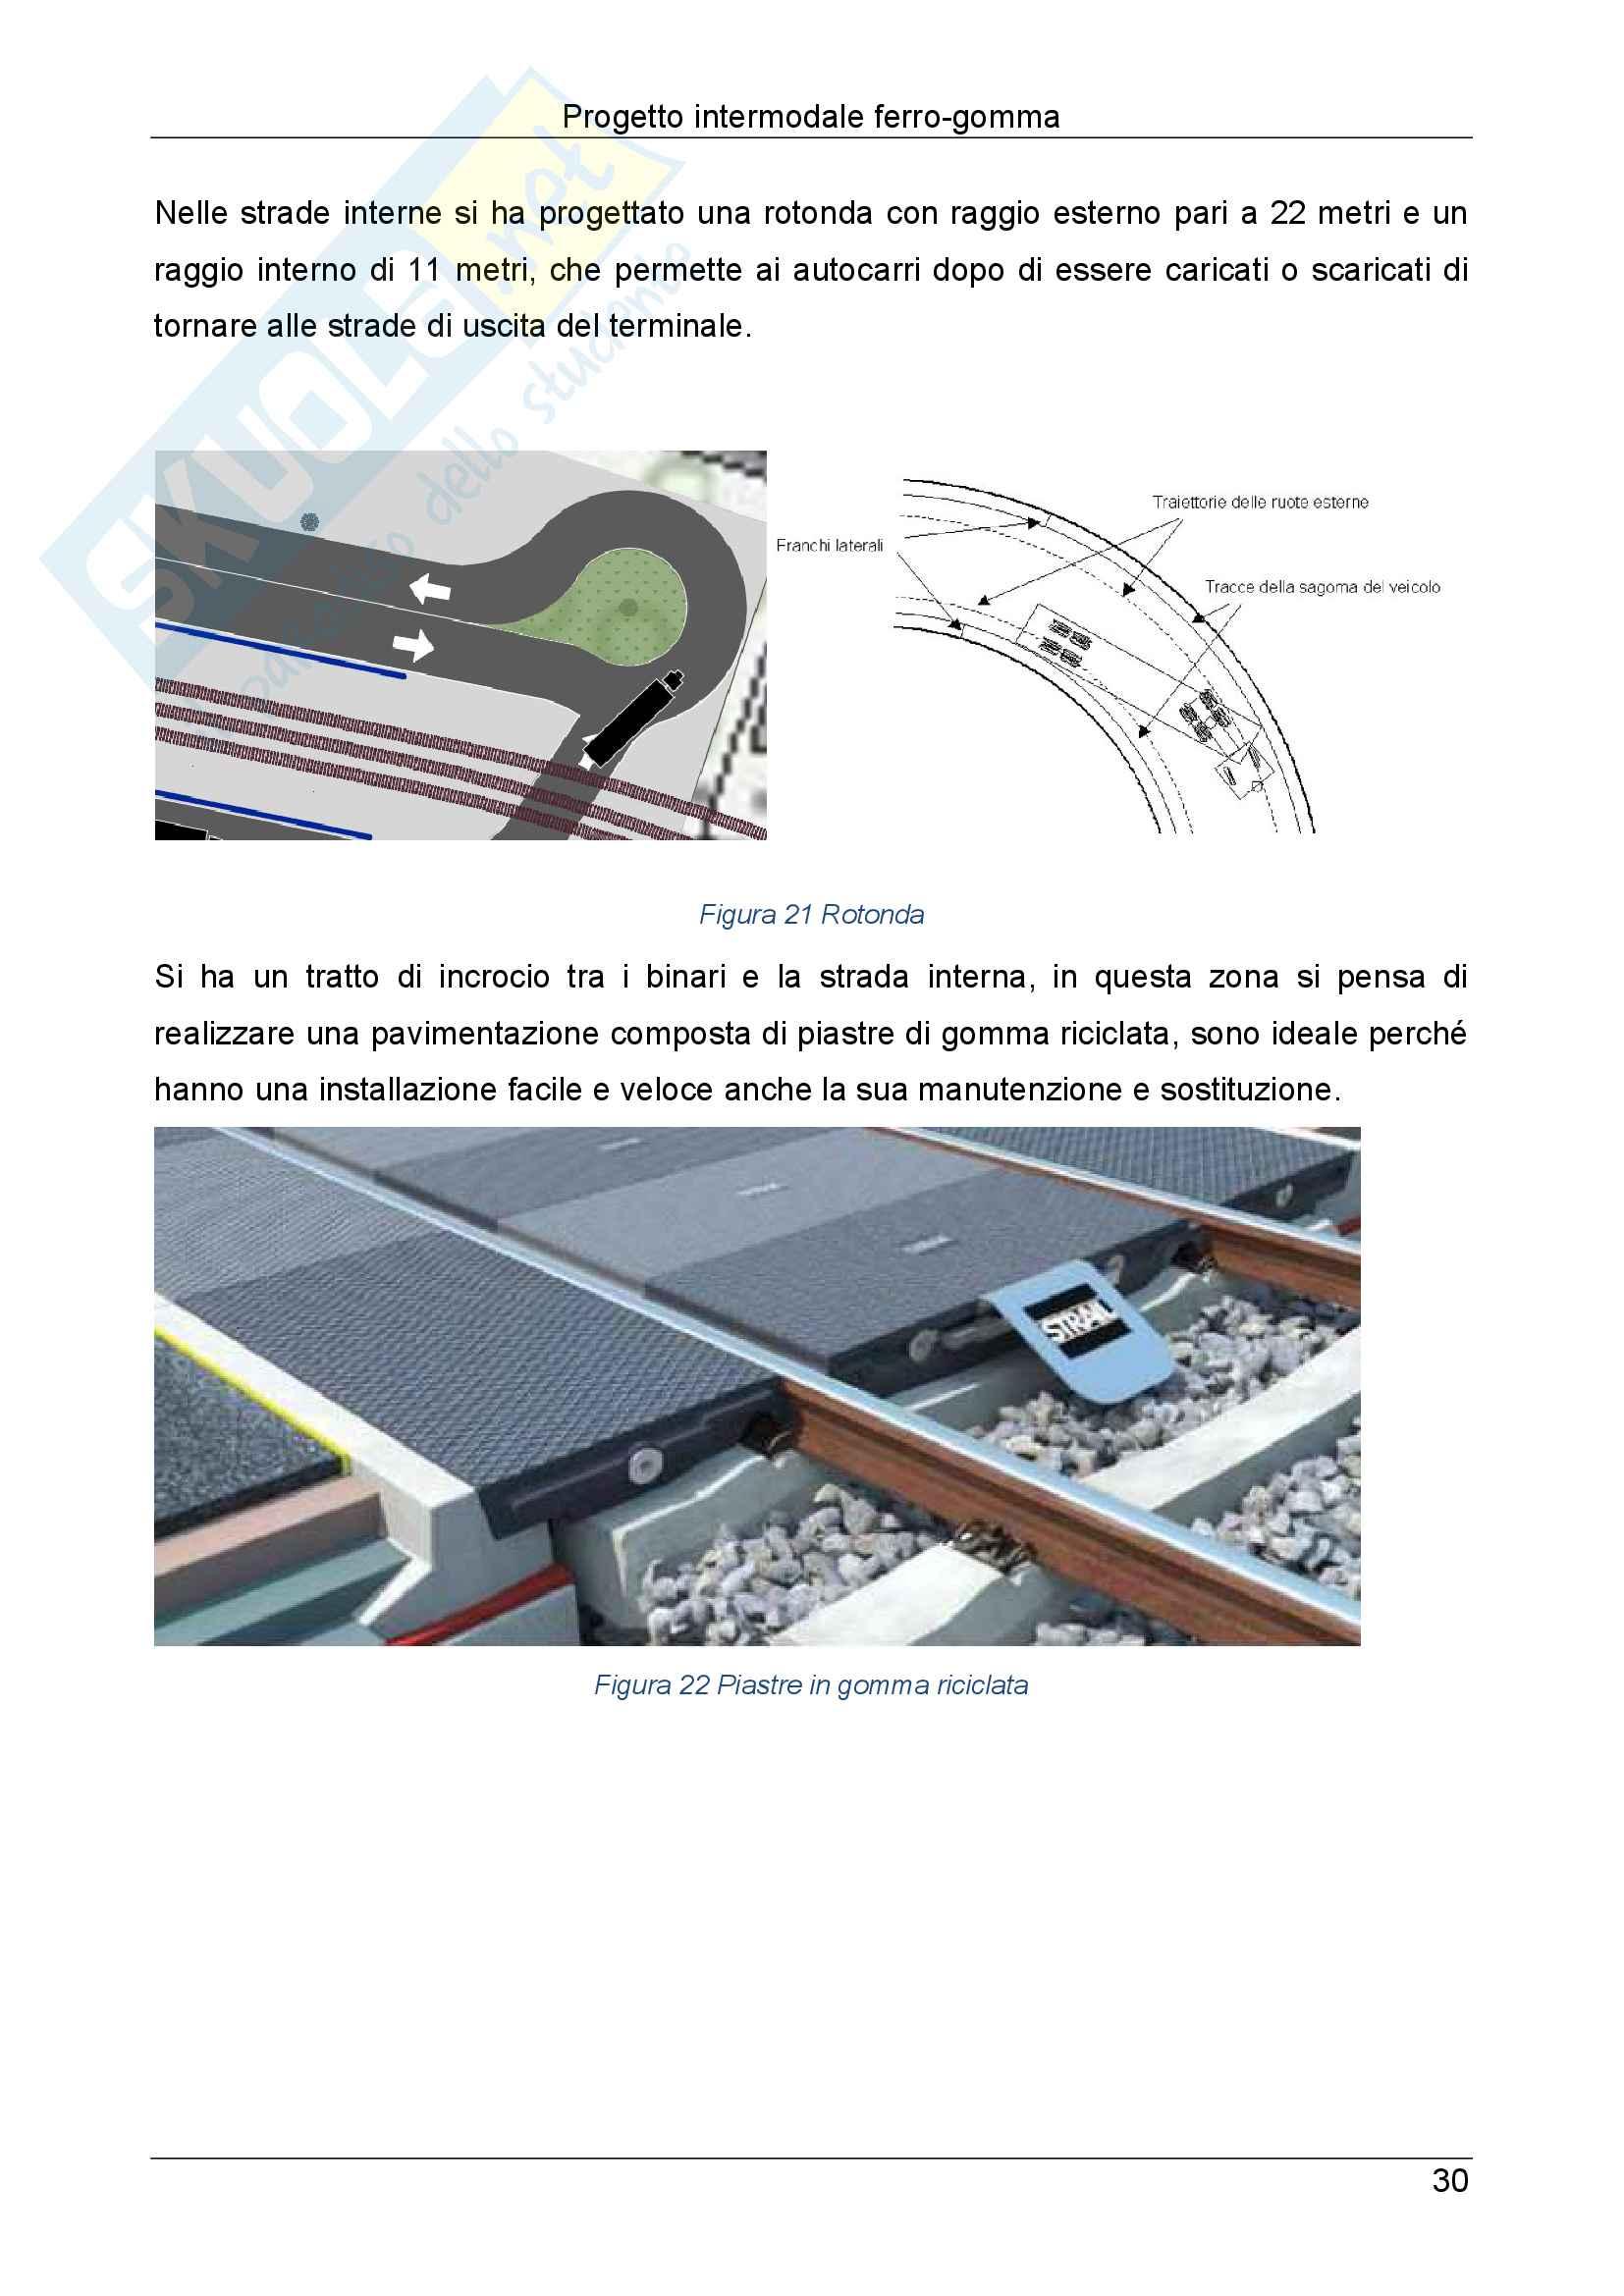 Terminal intermodale Chiasso Pag. 31